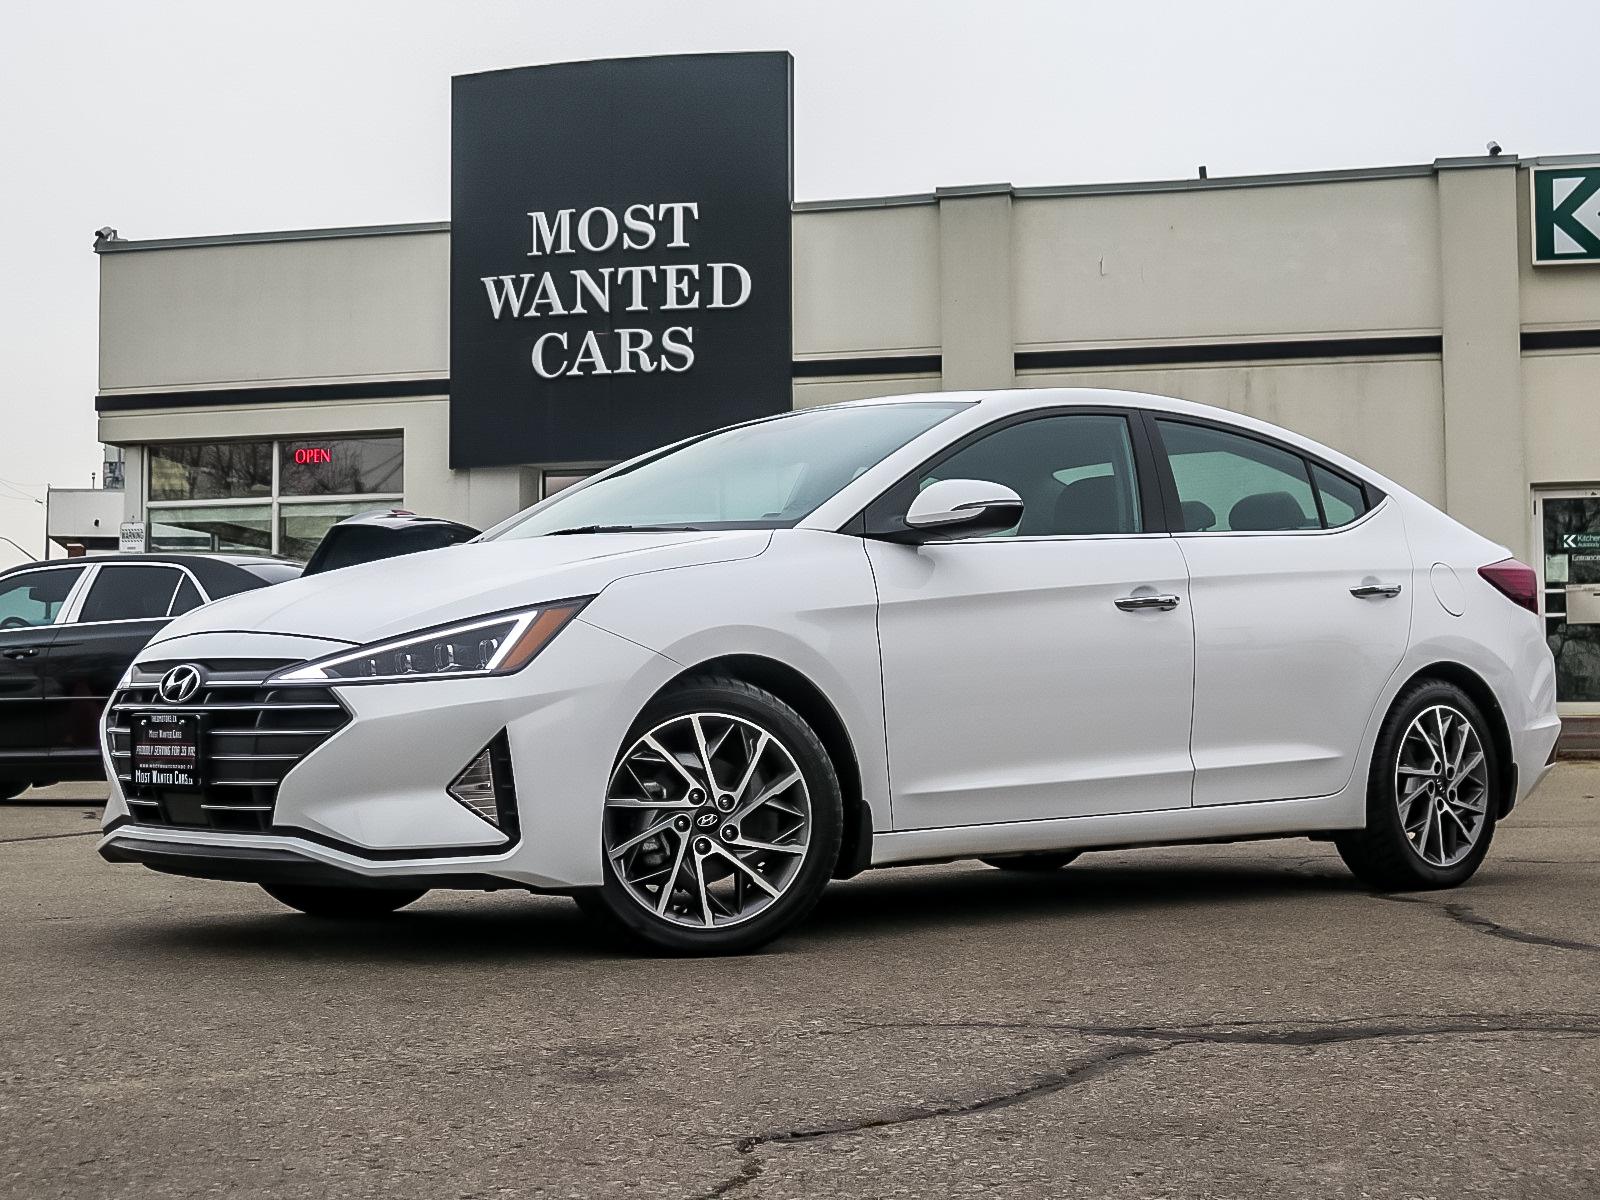 used 2020 Hyundai Elantra car, priced at $26,491